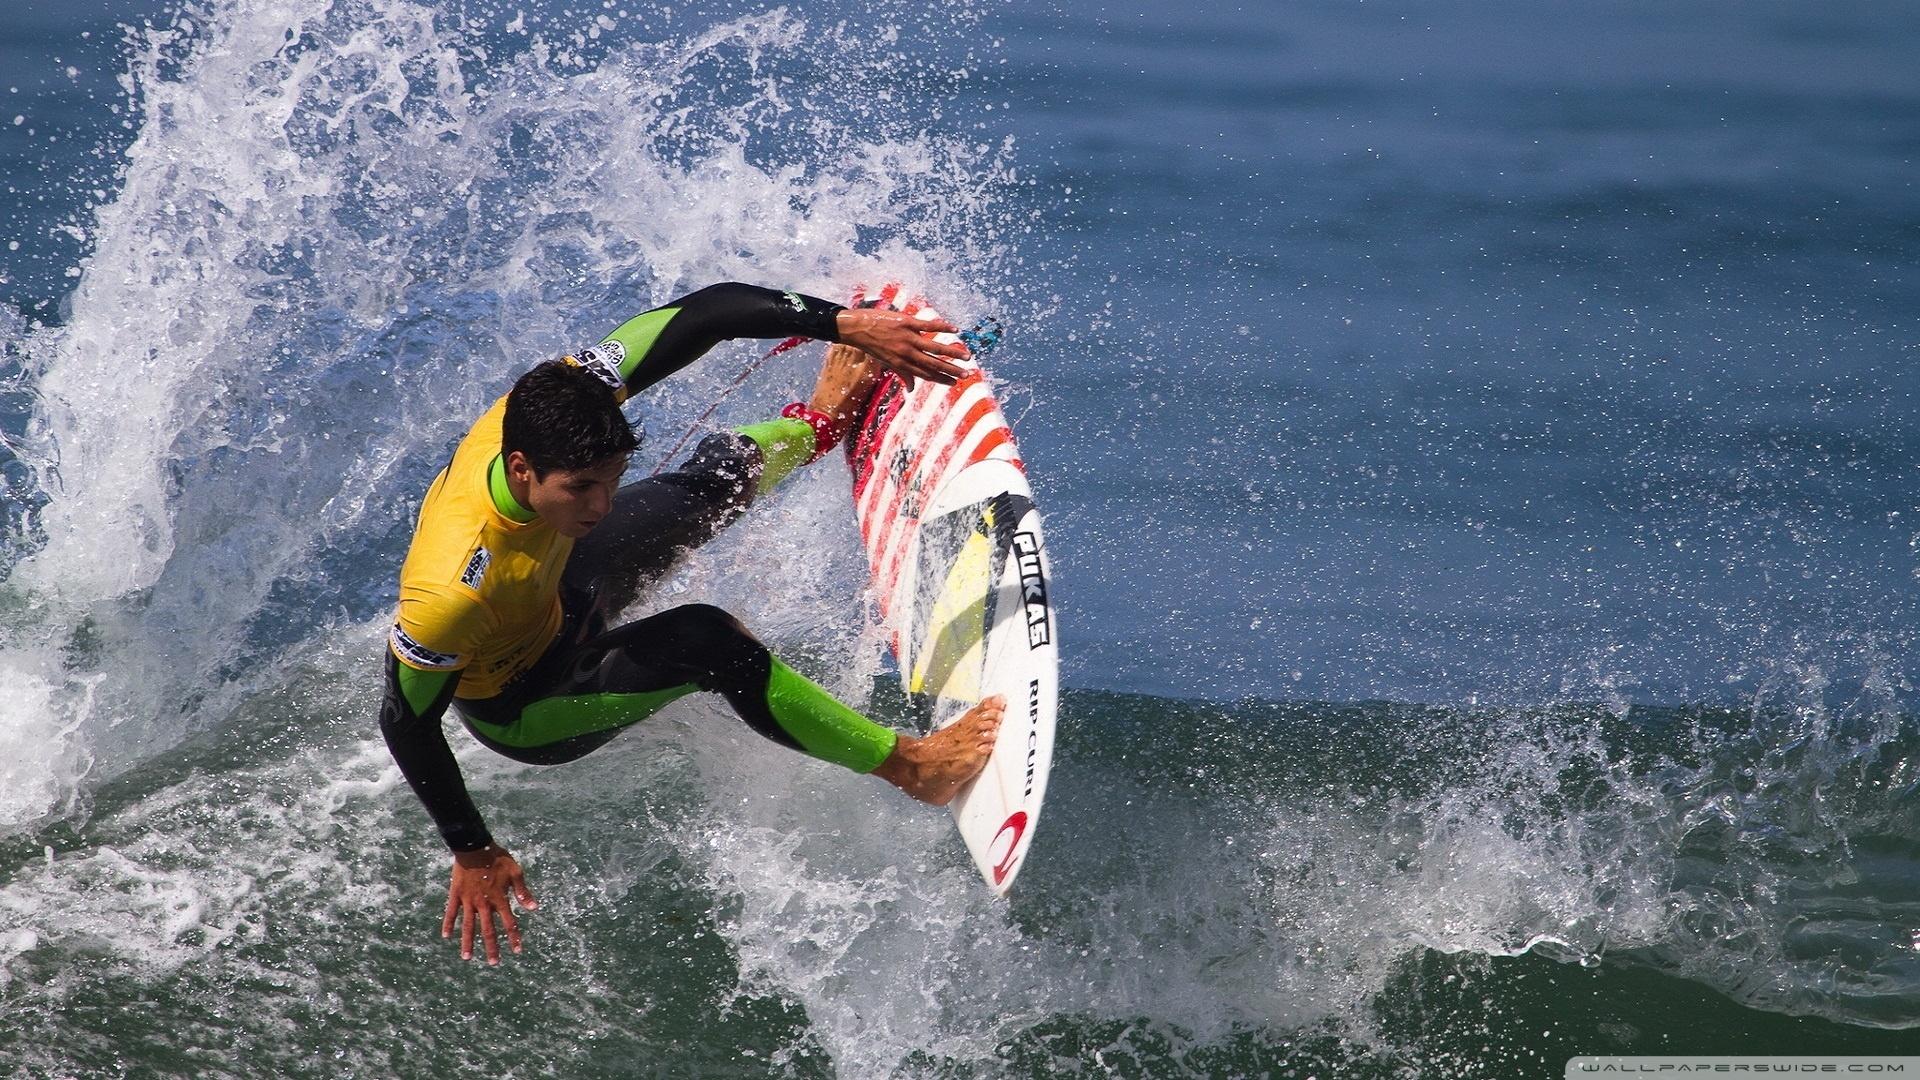 Image: Surf wallpaper HD 0013 - Album: Surf: Wallpaper, wallpapers ...